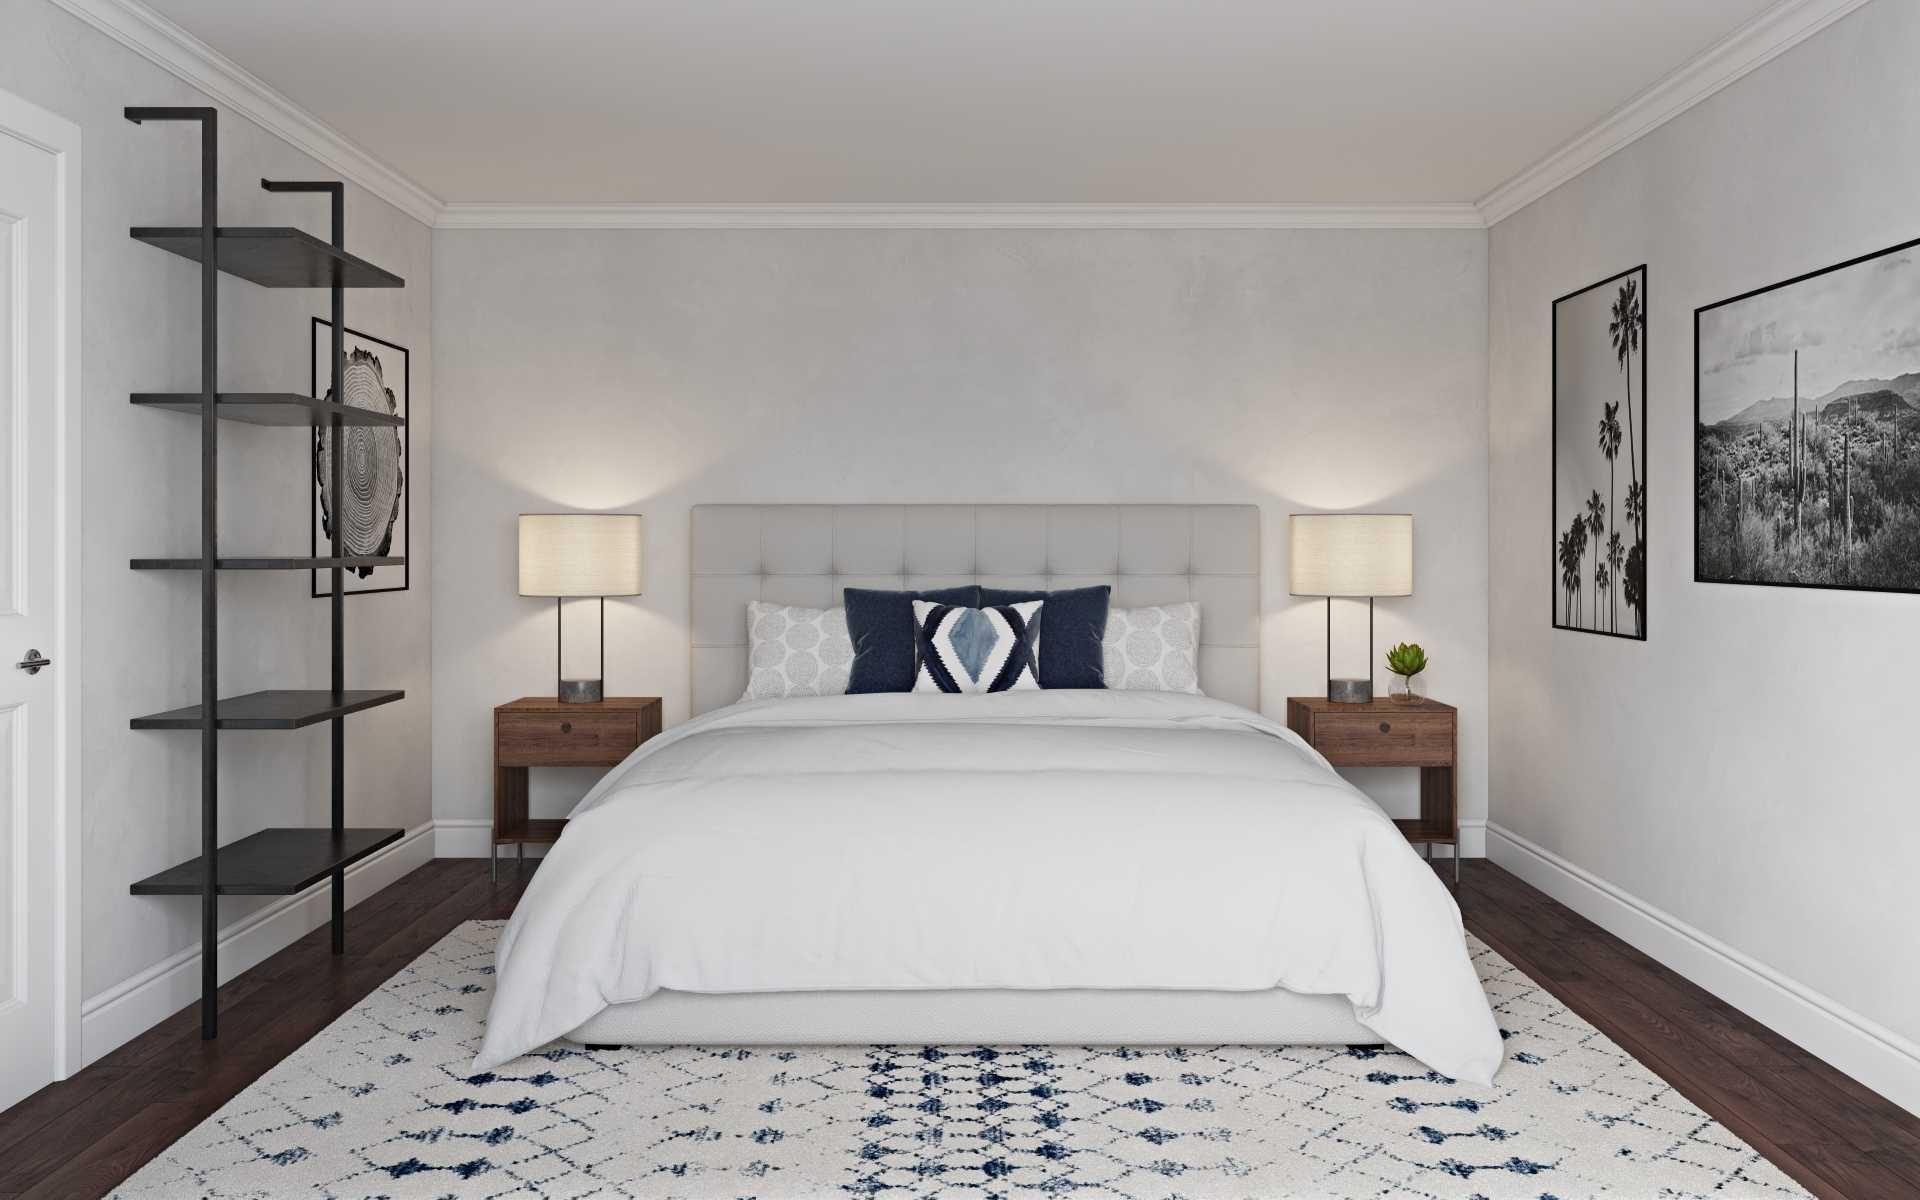 Bedroom Design By Havenly Interior Designer Susannah Bedroom Interior Interior Design Interior Design Bedroom